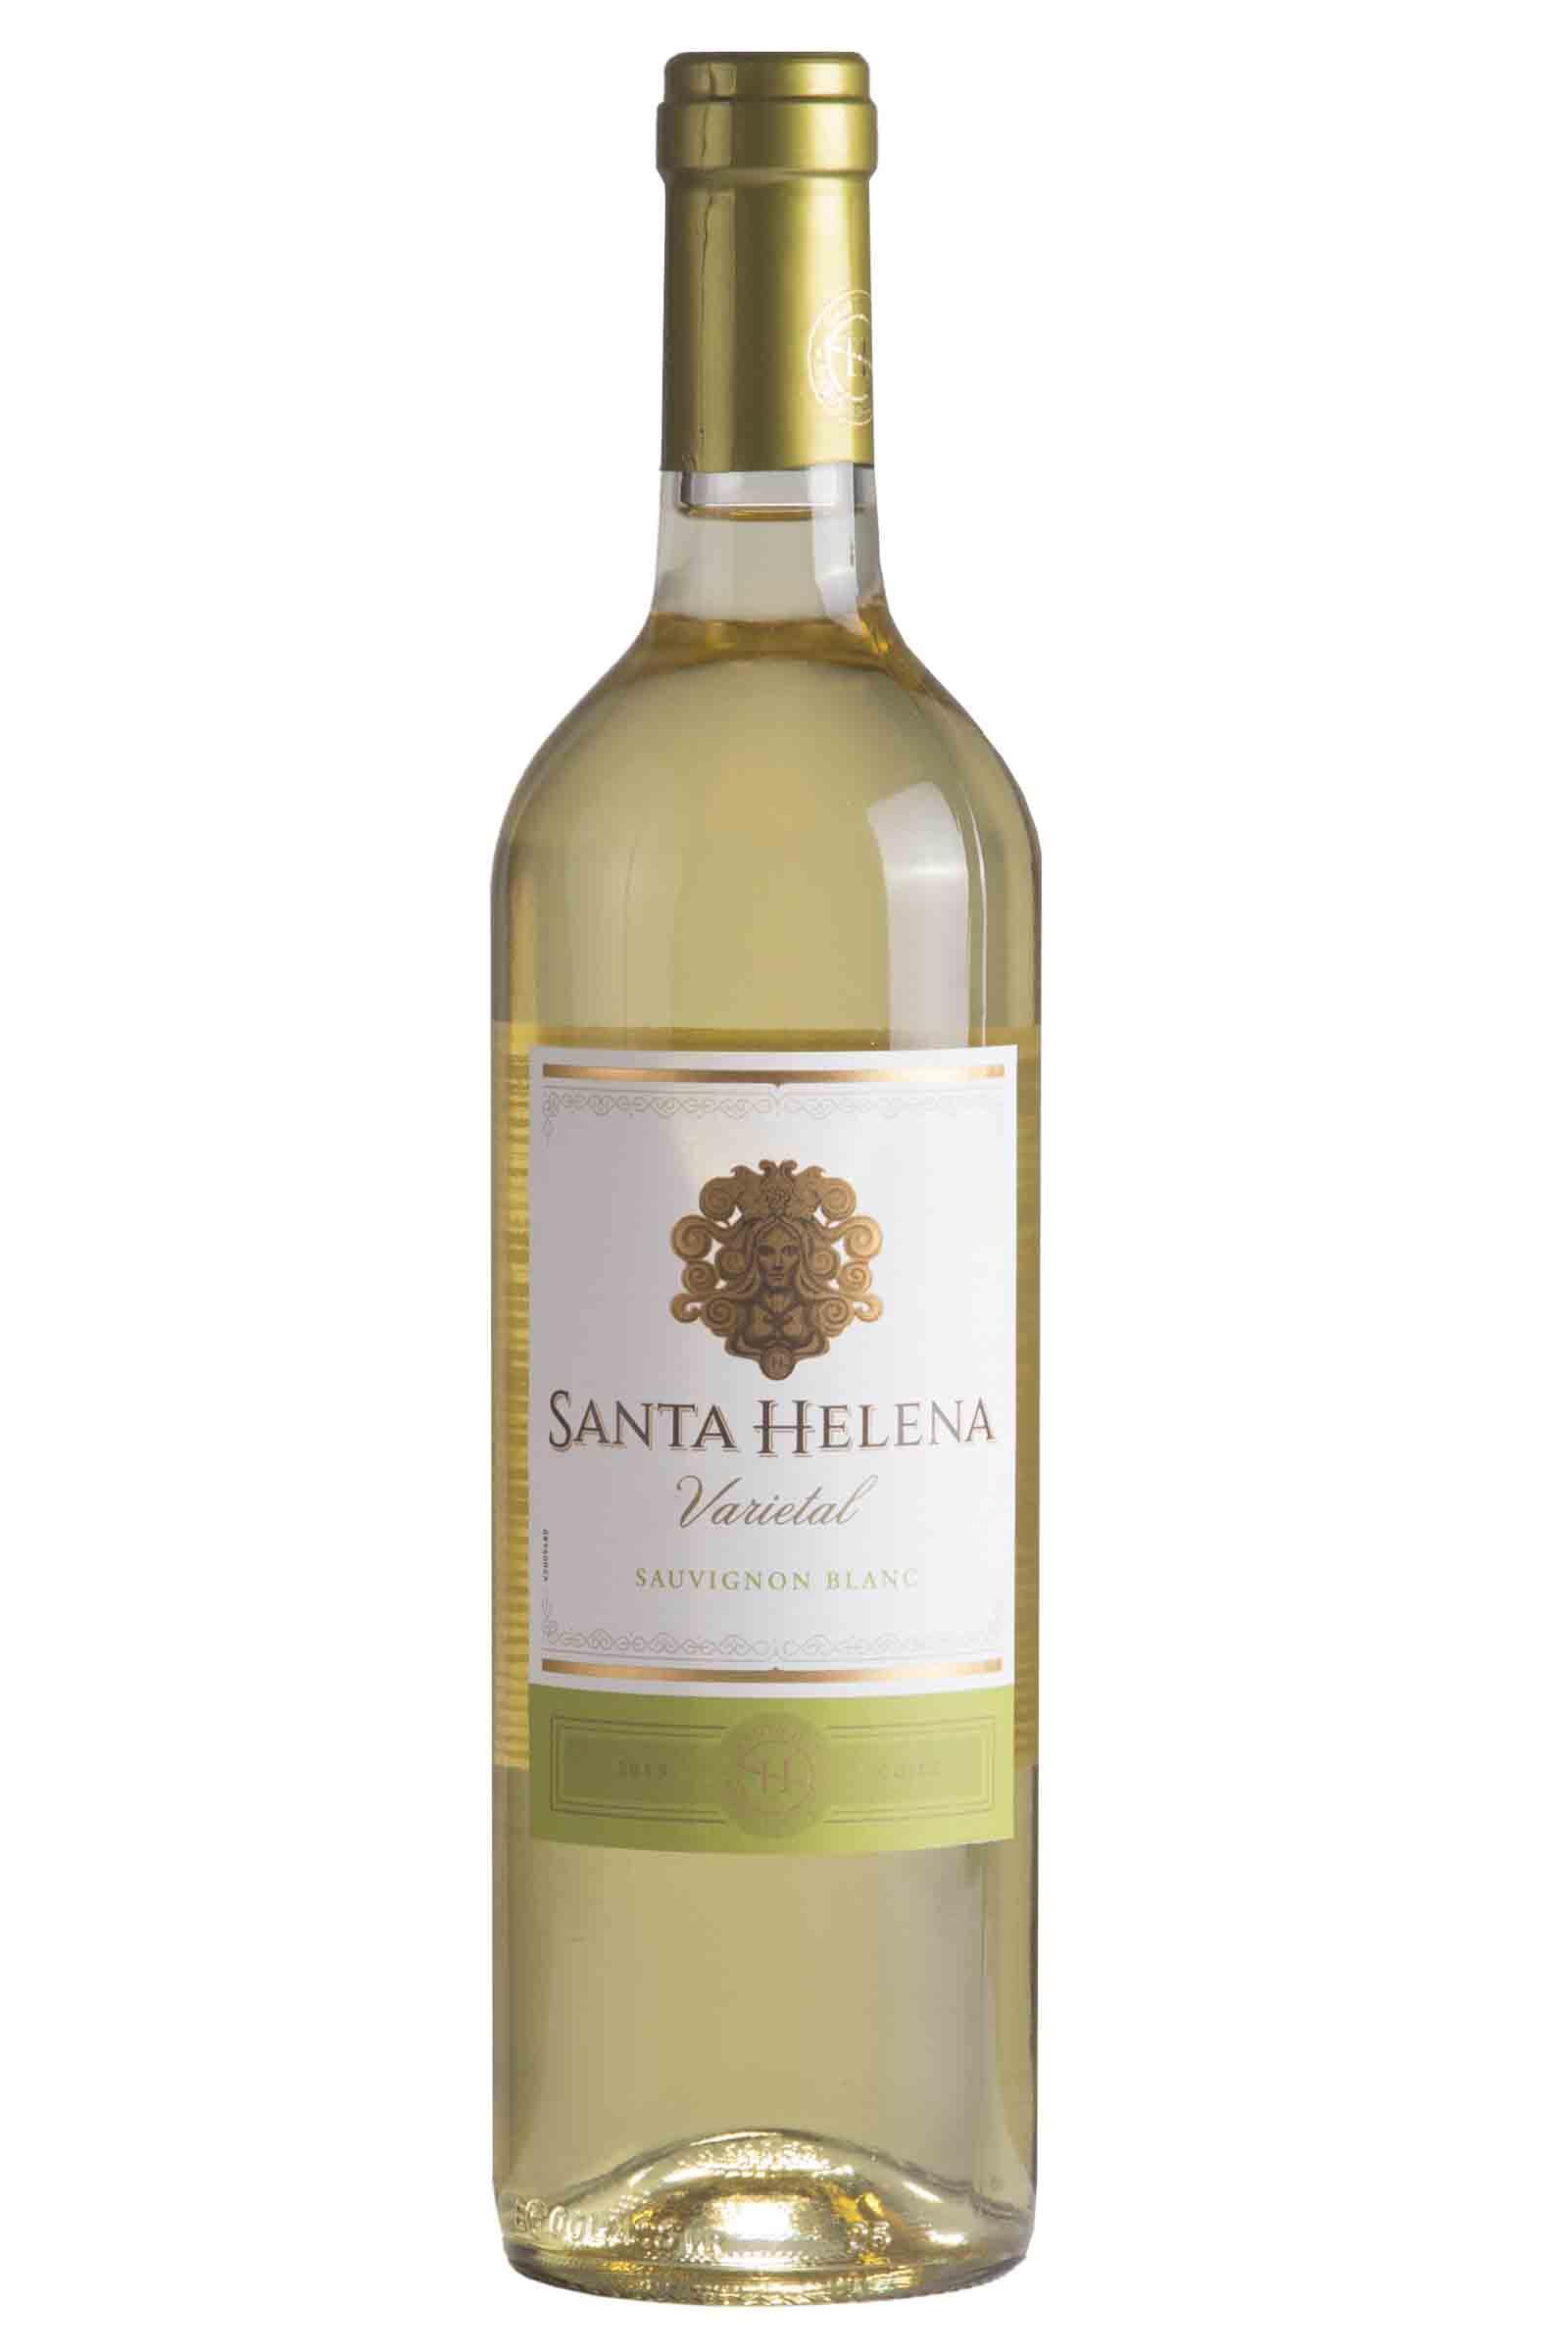 Vino Santa Helena Varietal Sauvignon Blanc 750ml